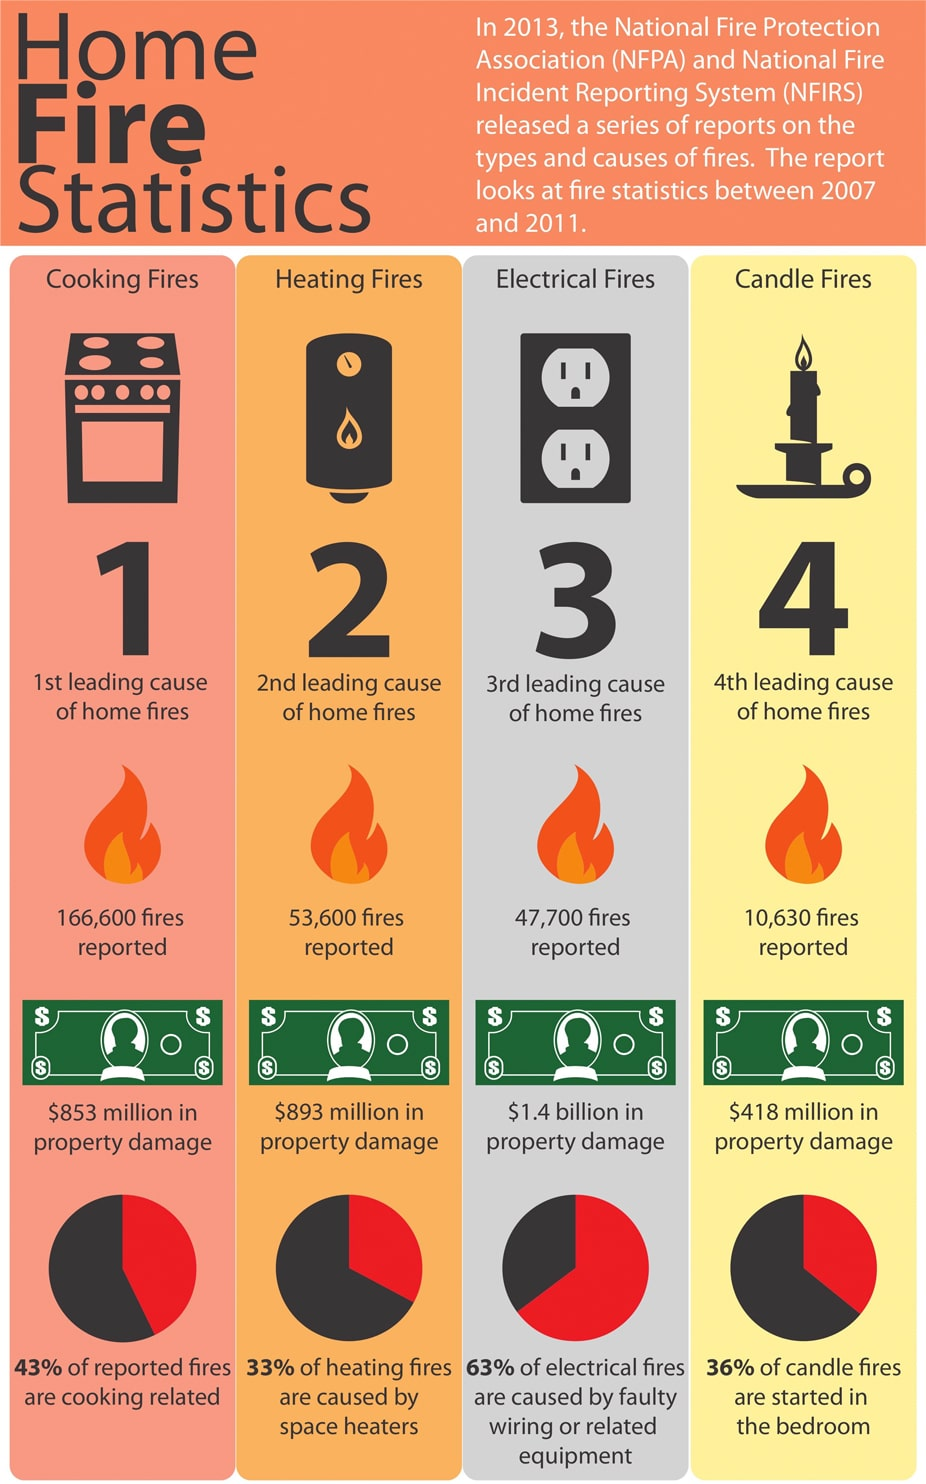 Home Fire Statistics